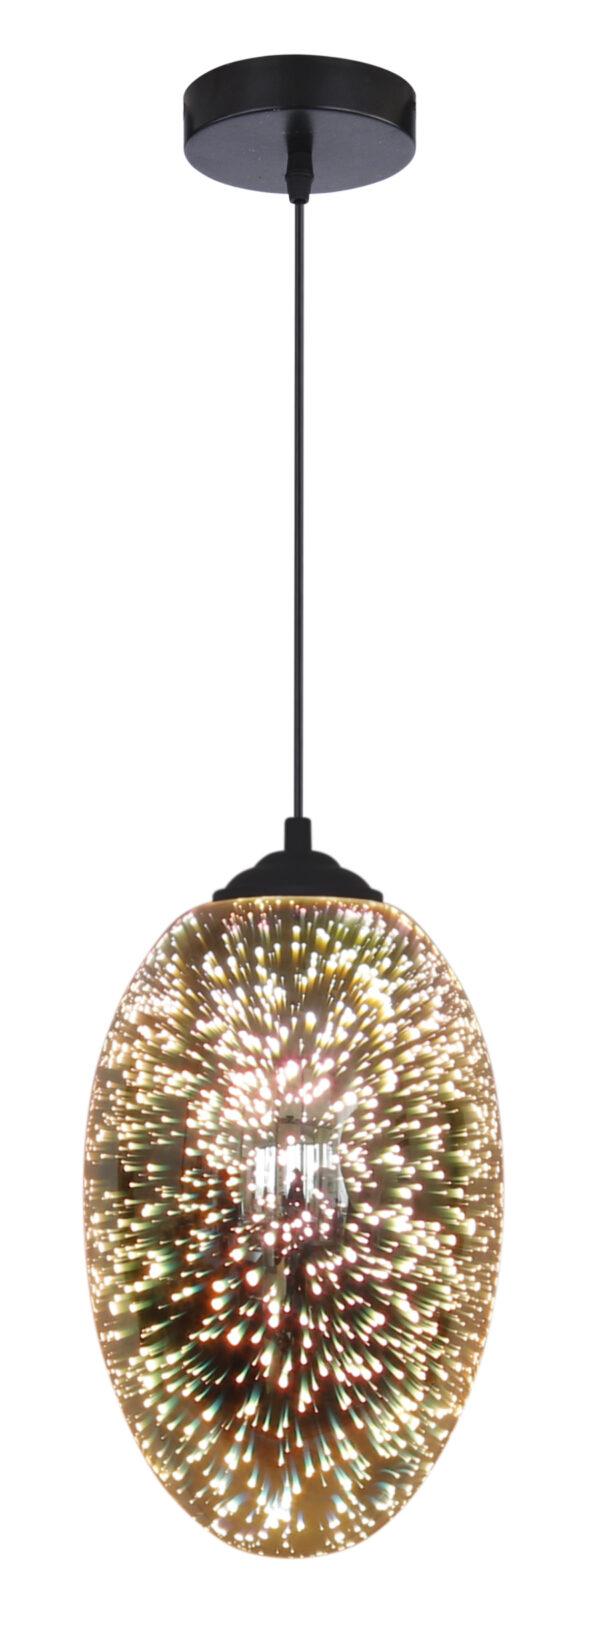 GALACTIC 1 LAMPA WISZĄCA 20 1X60W E27 3D - 31-56122